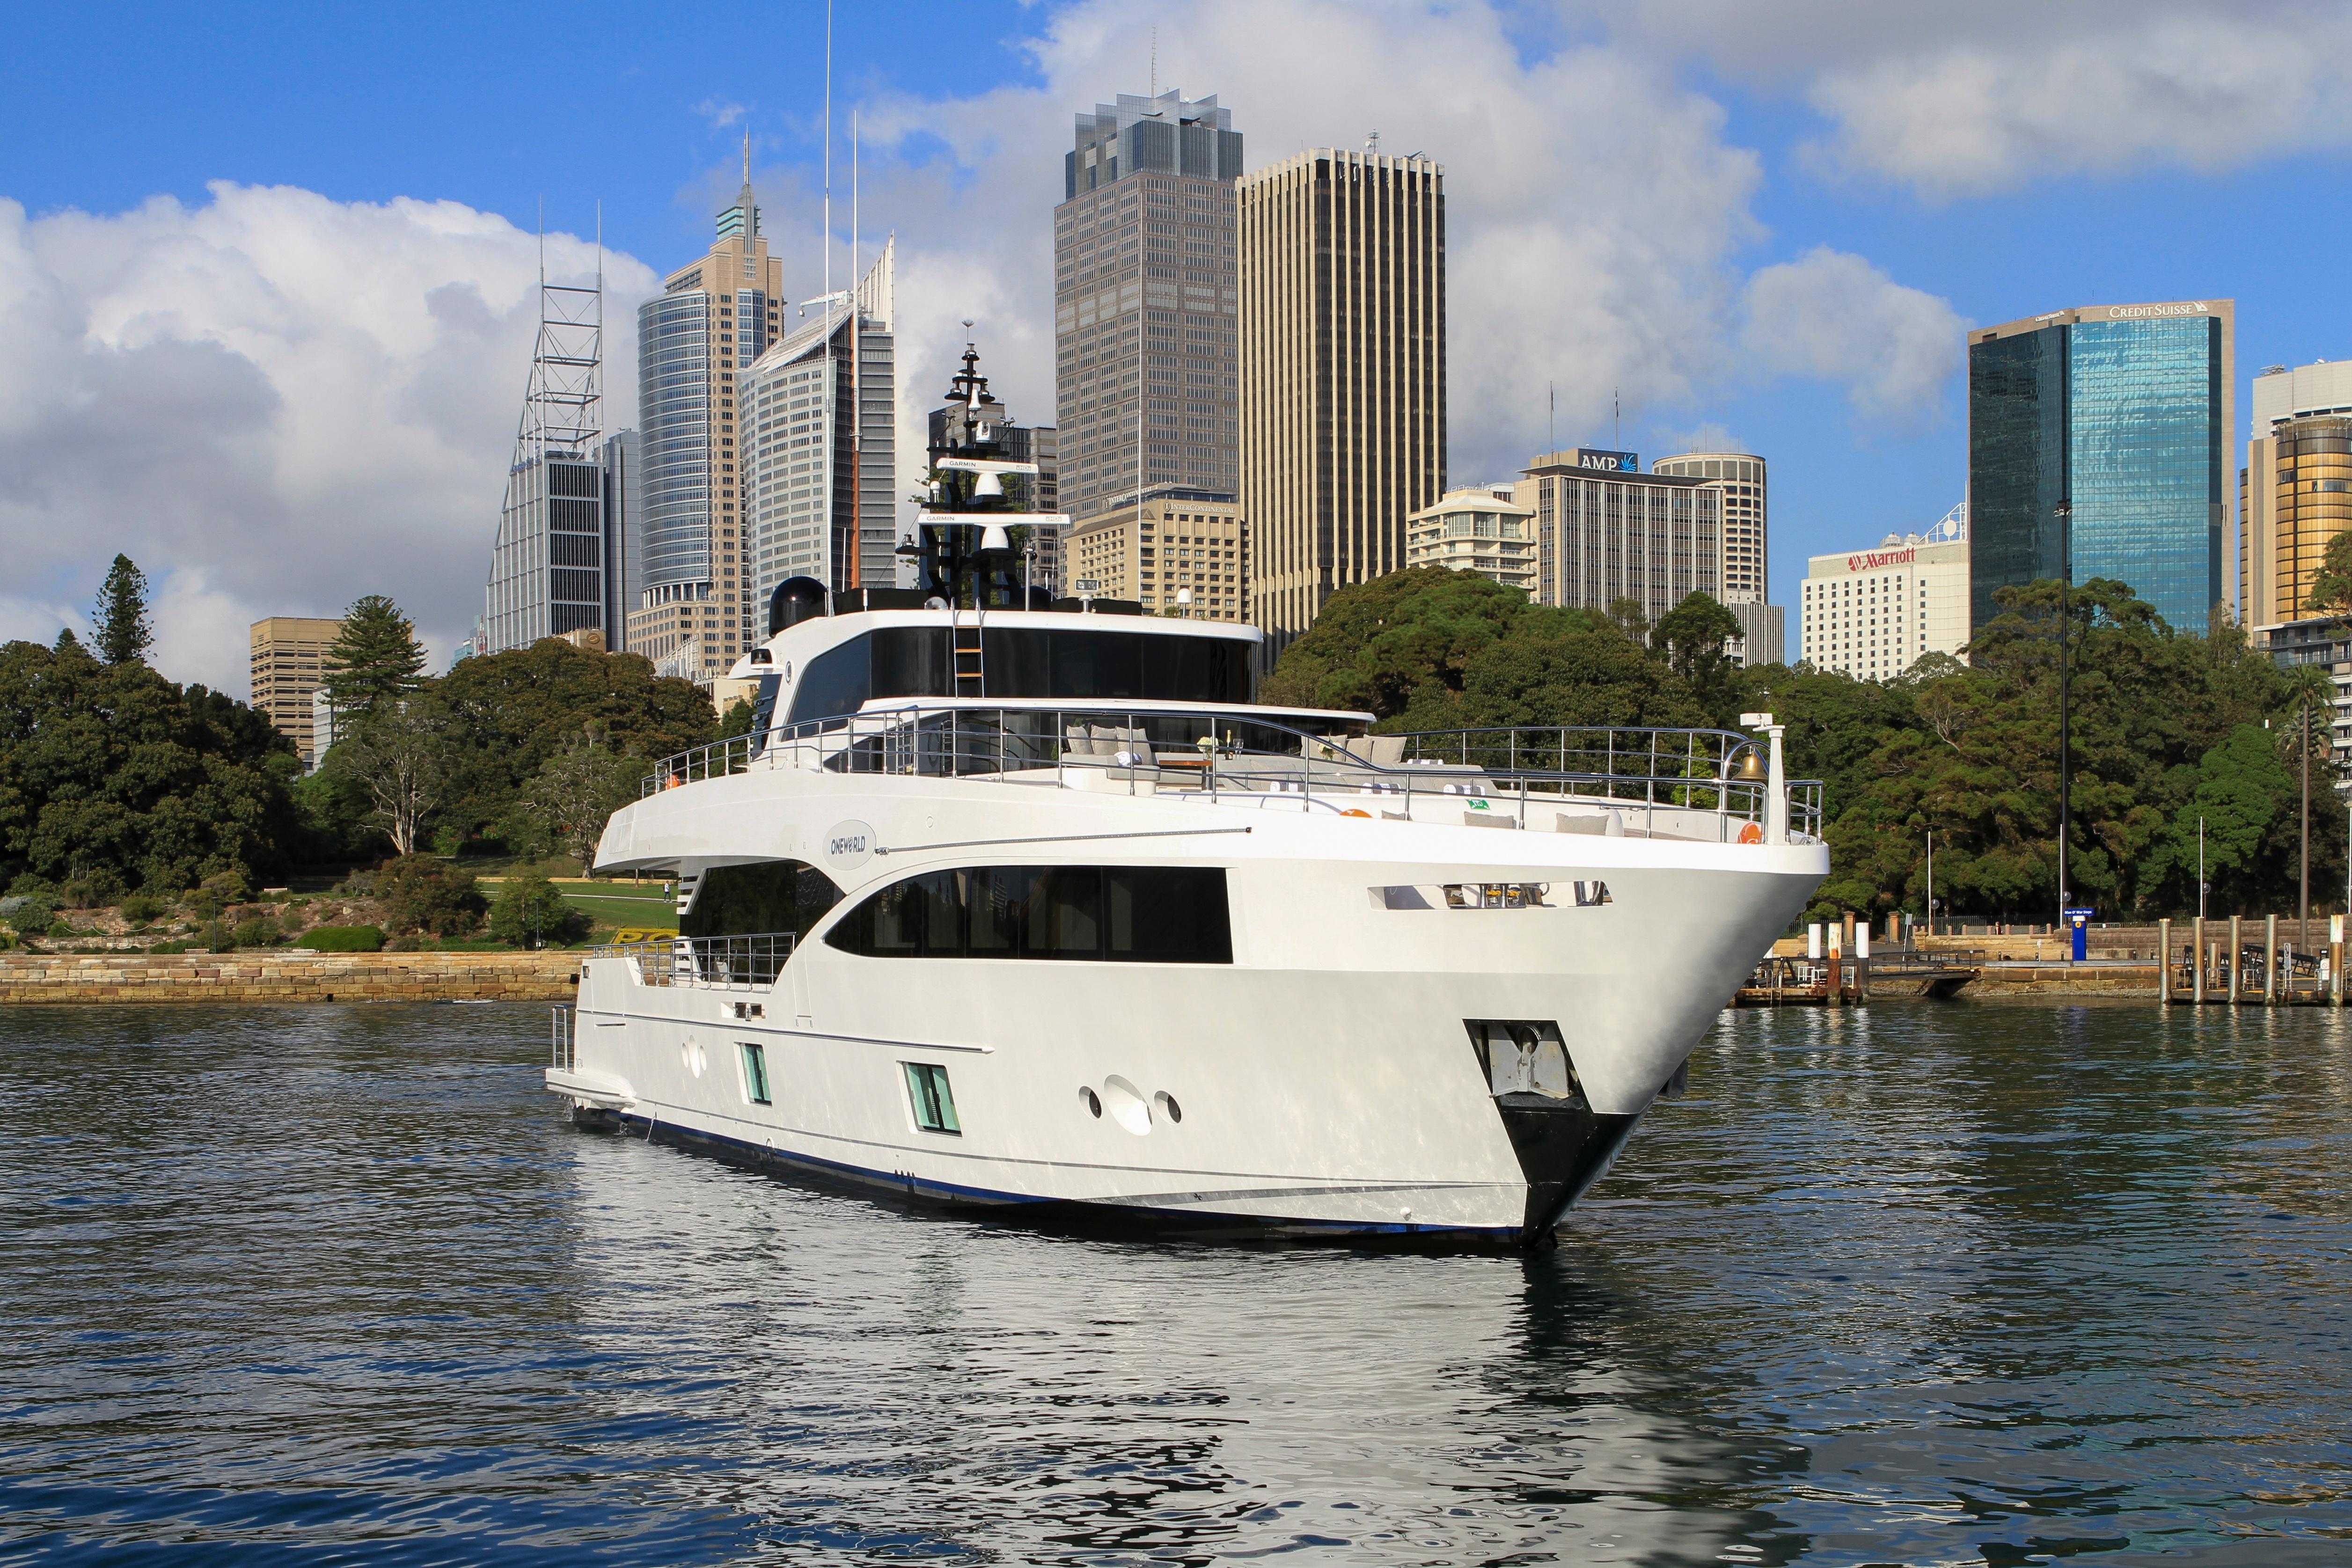 Majesty 100-3 MY Oneworld Sydney Harbour 7 April 2018 Richard Morris Australian Superyachts (143).jpg